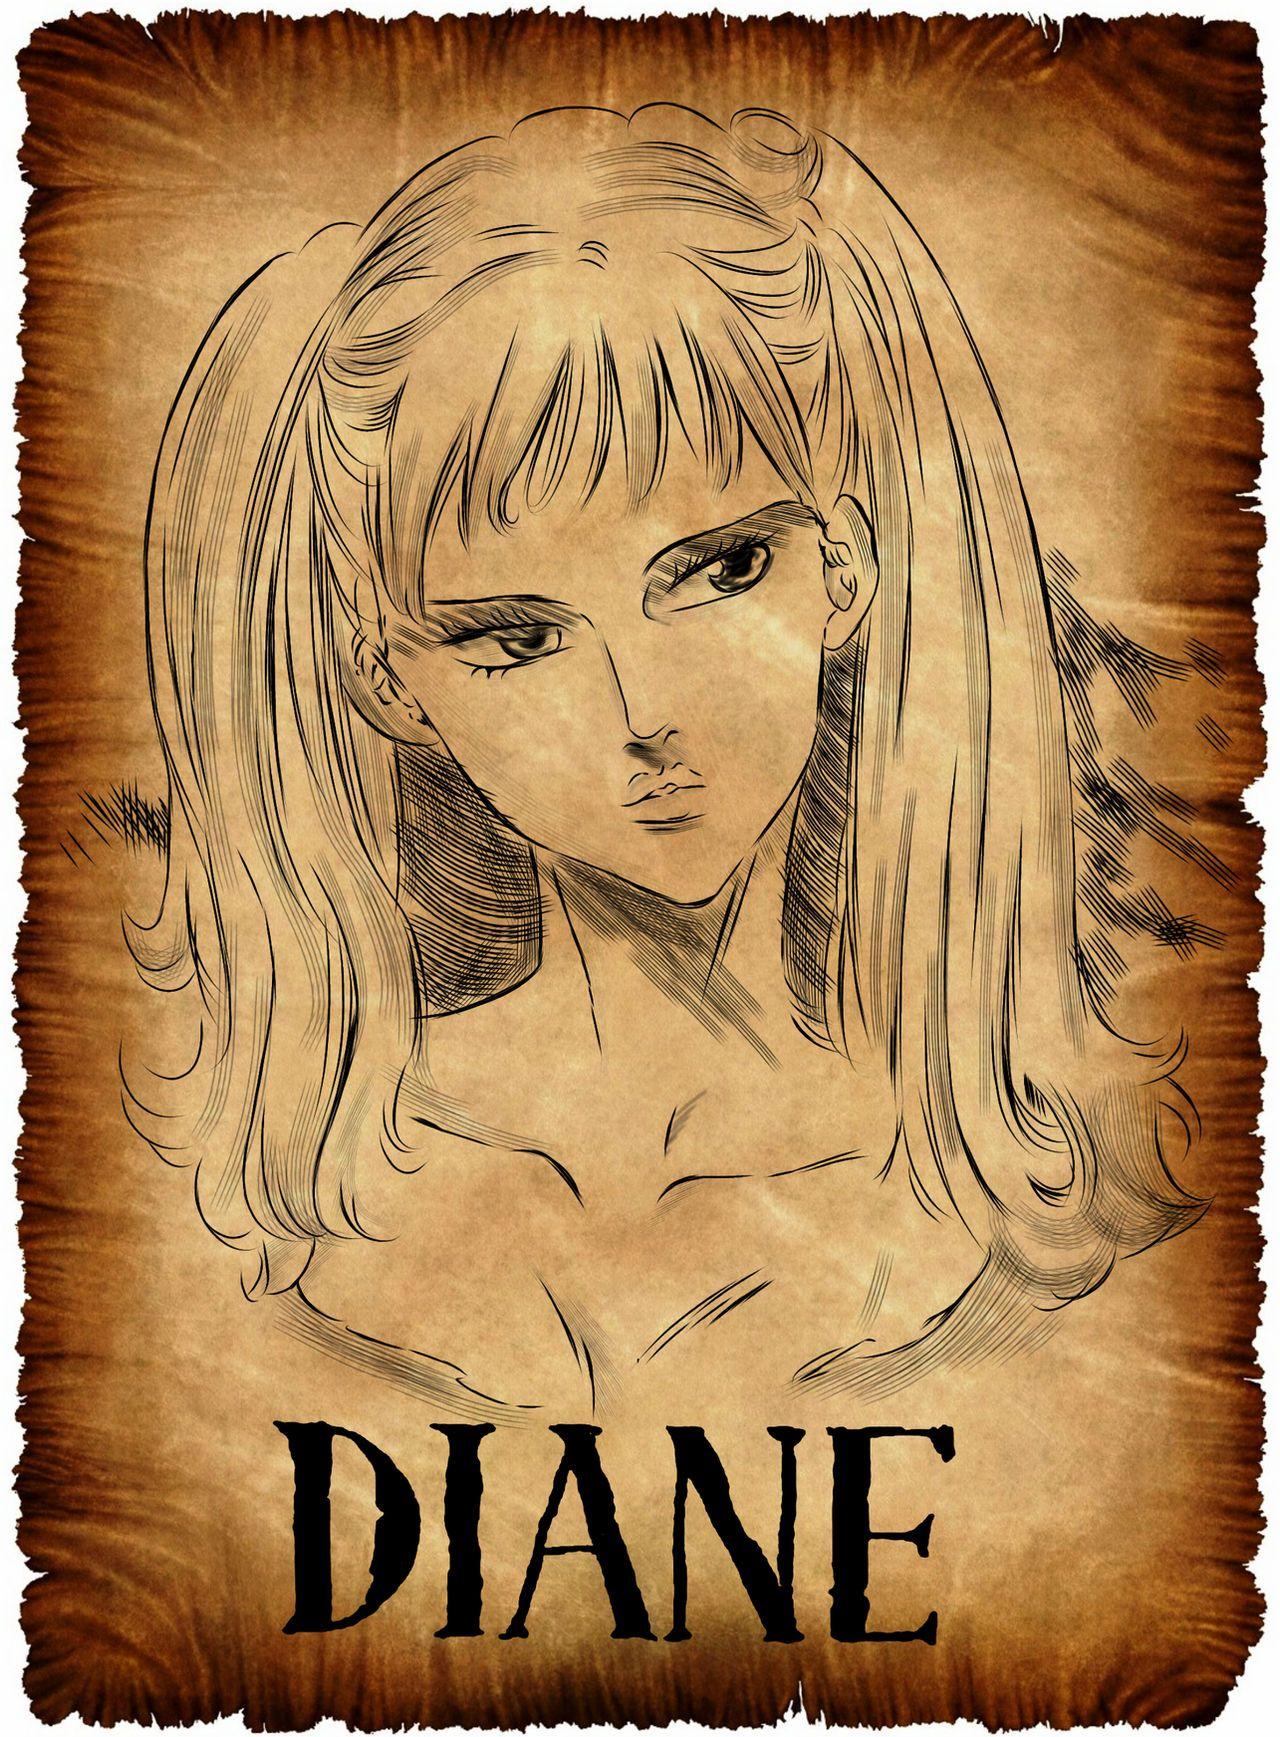 Diane nanatsu no taizai by d4nartss on DeviantArt